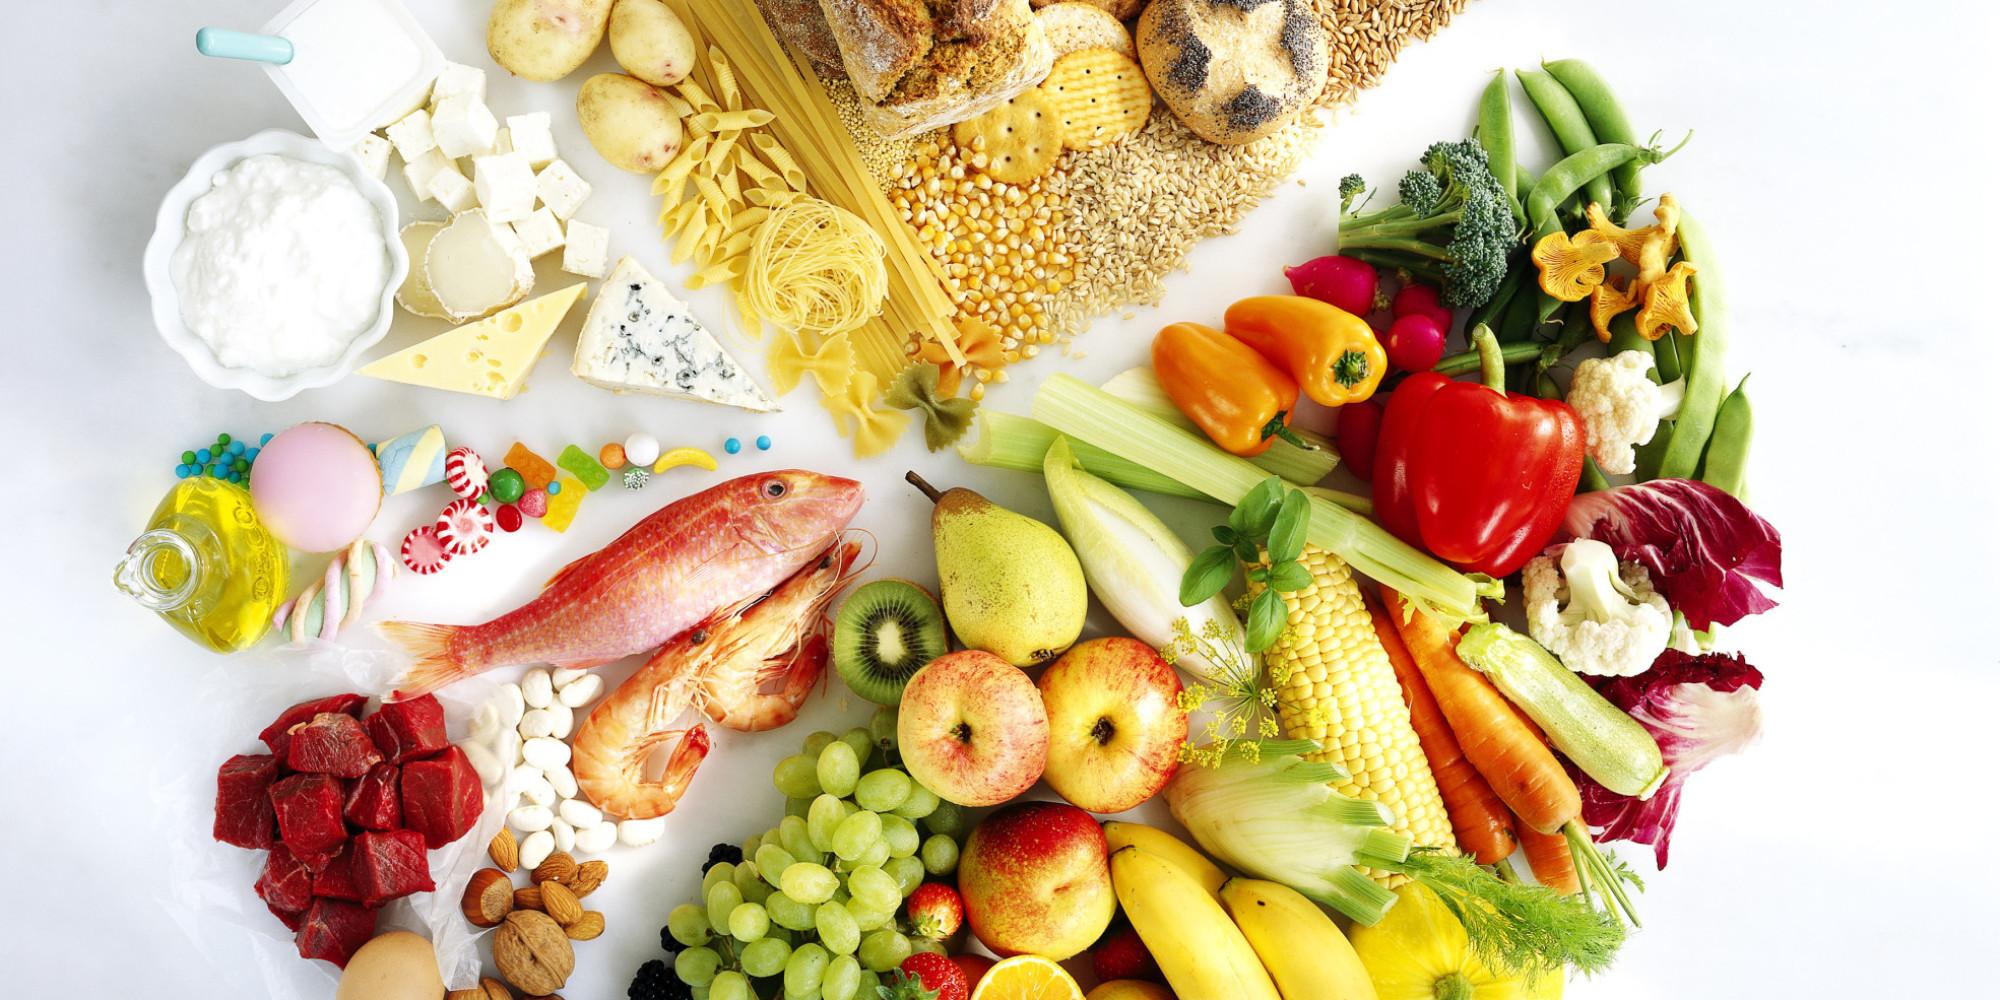 Диета при сахарном диабете: стол 9, меню на неделю